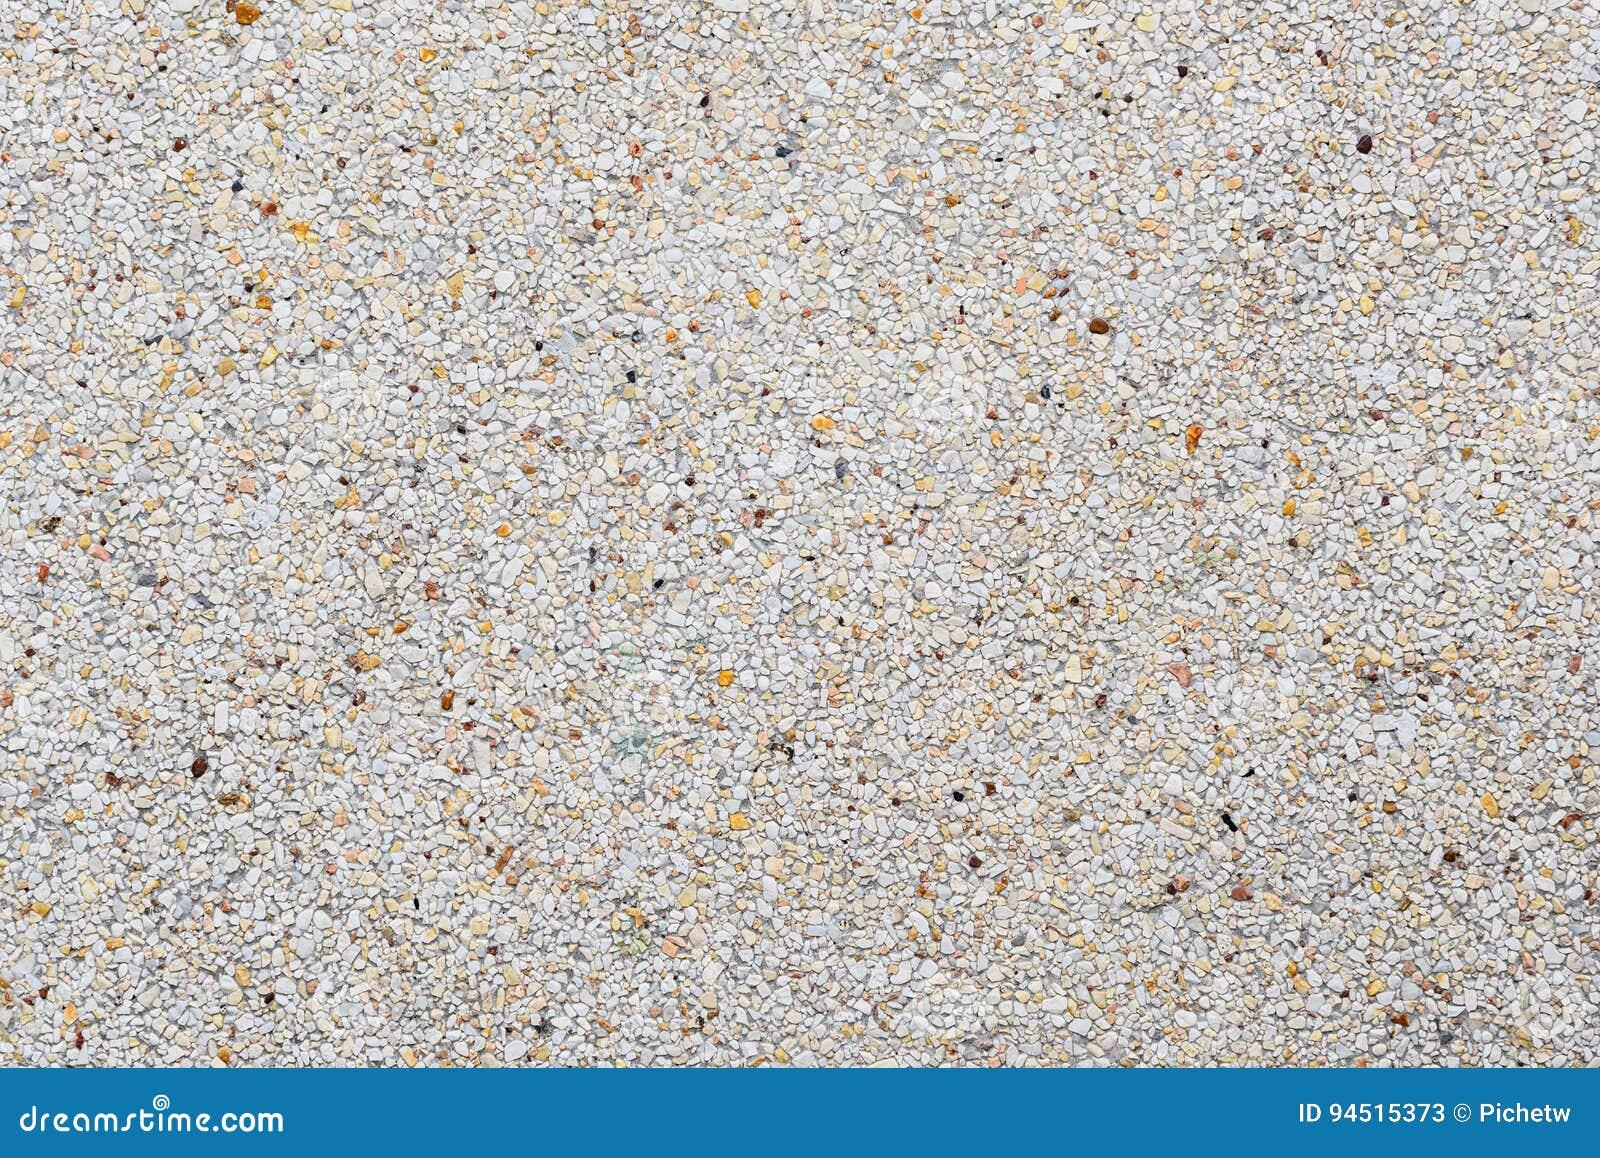 Final global expuesto o textura concreta lavada